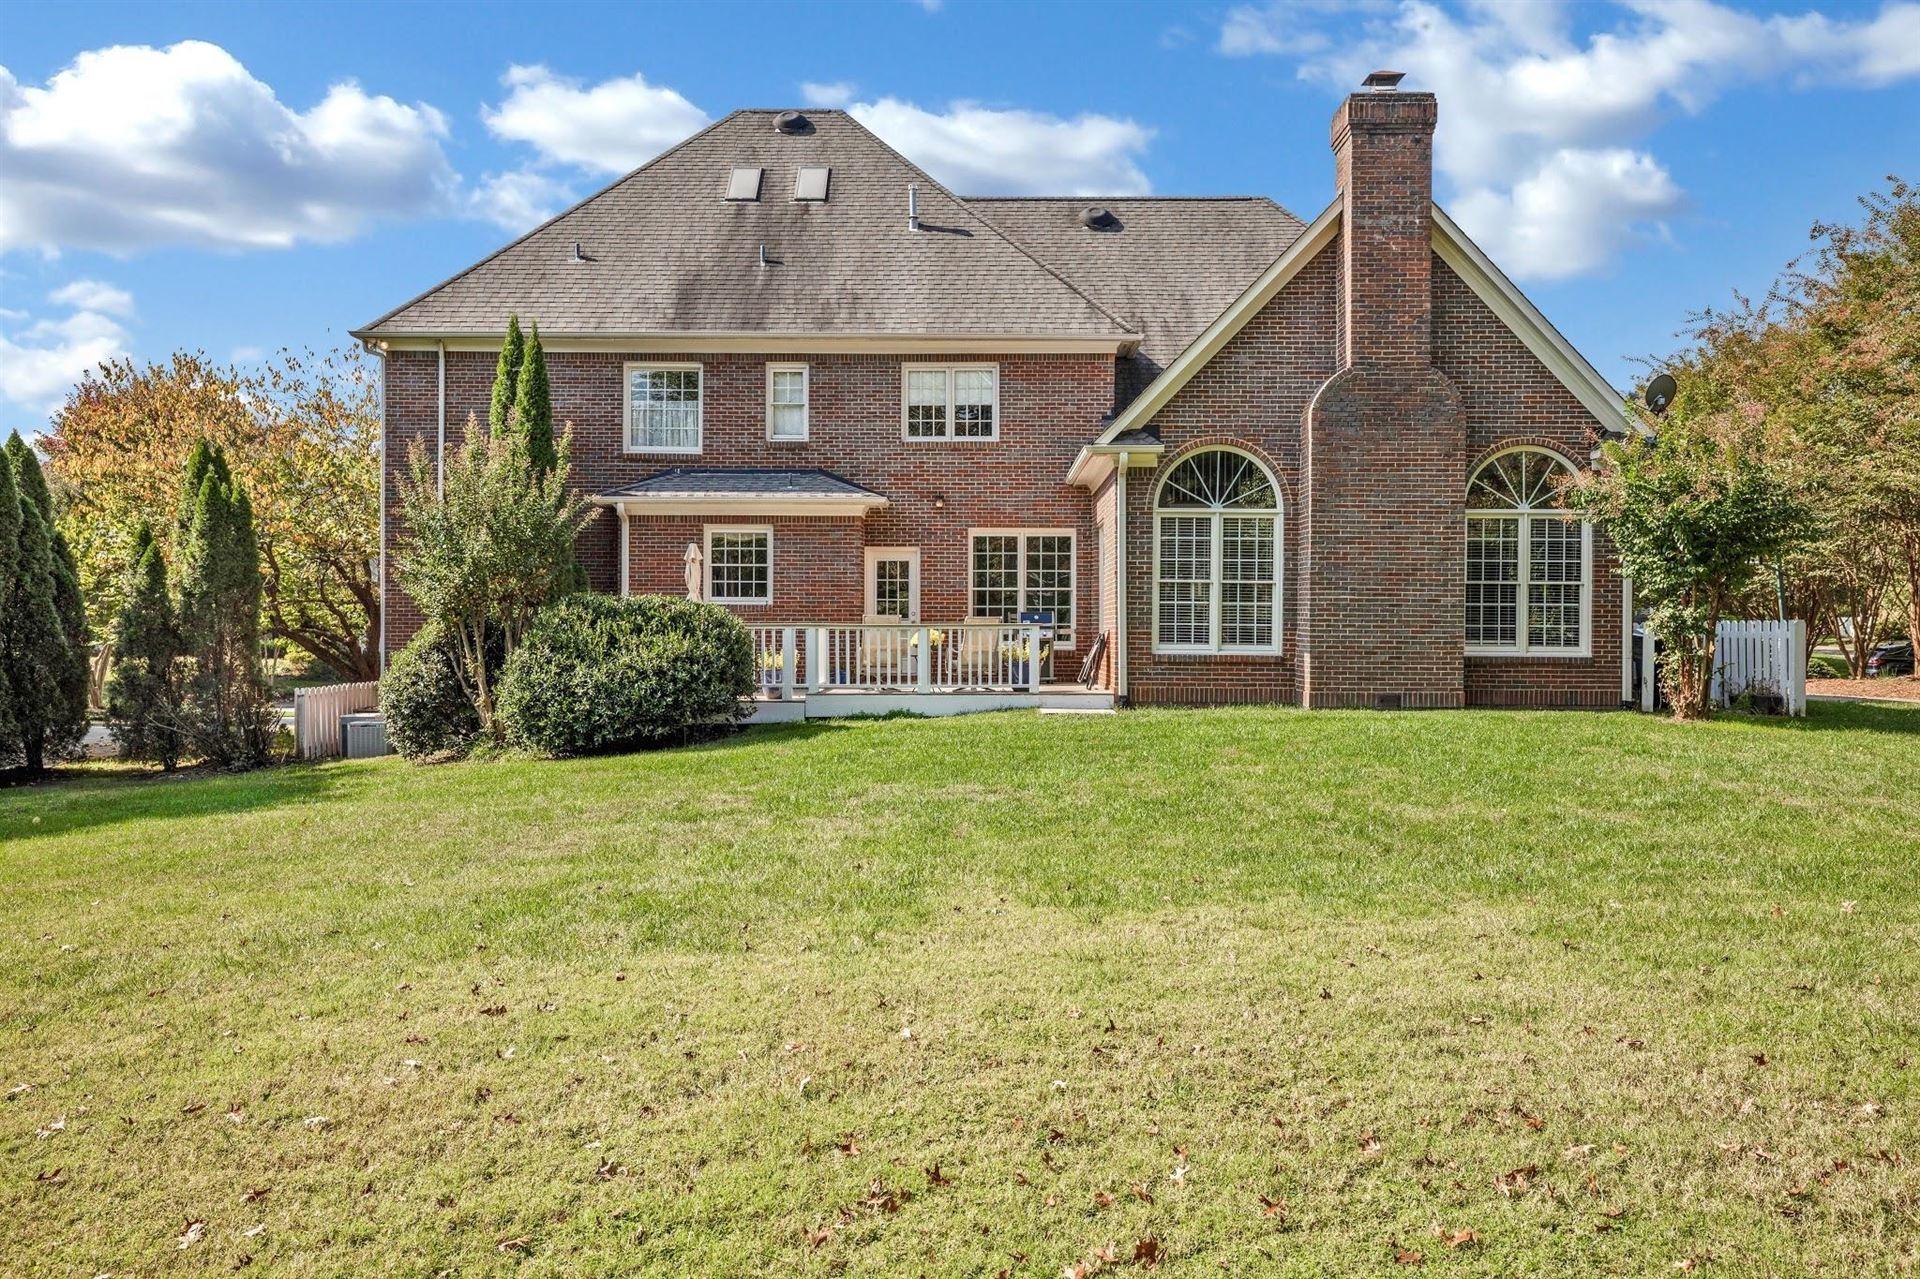 Photo of 912 Weatherly Hills Blvd, Farragut, TN 37934 (MLS # 1133095)